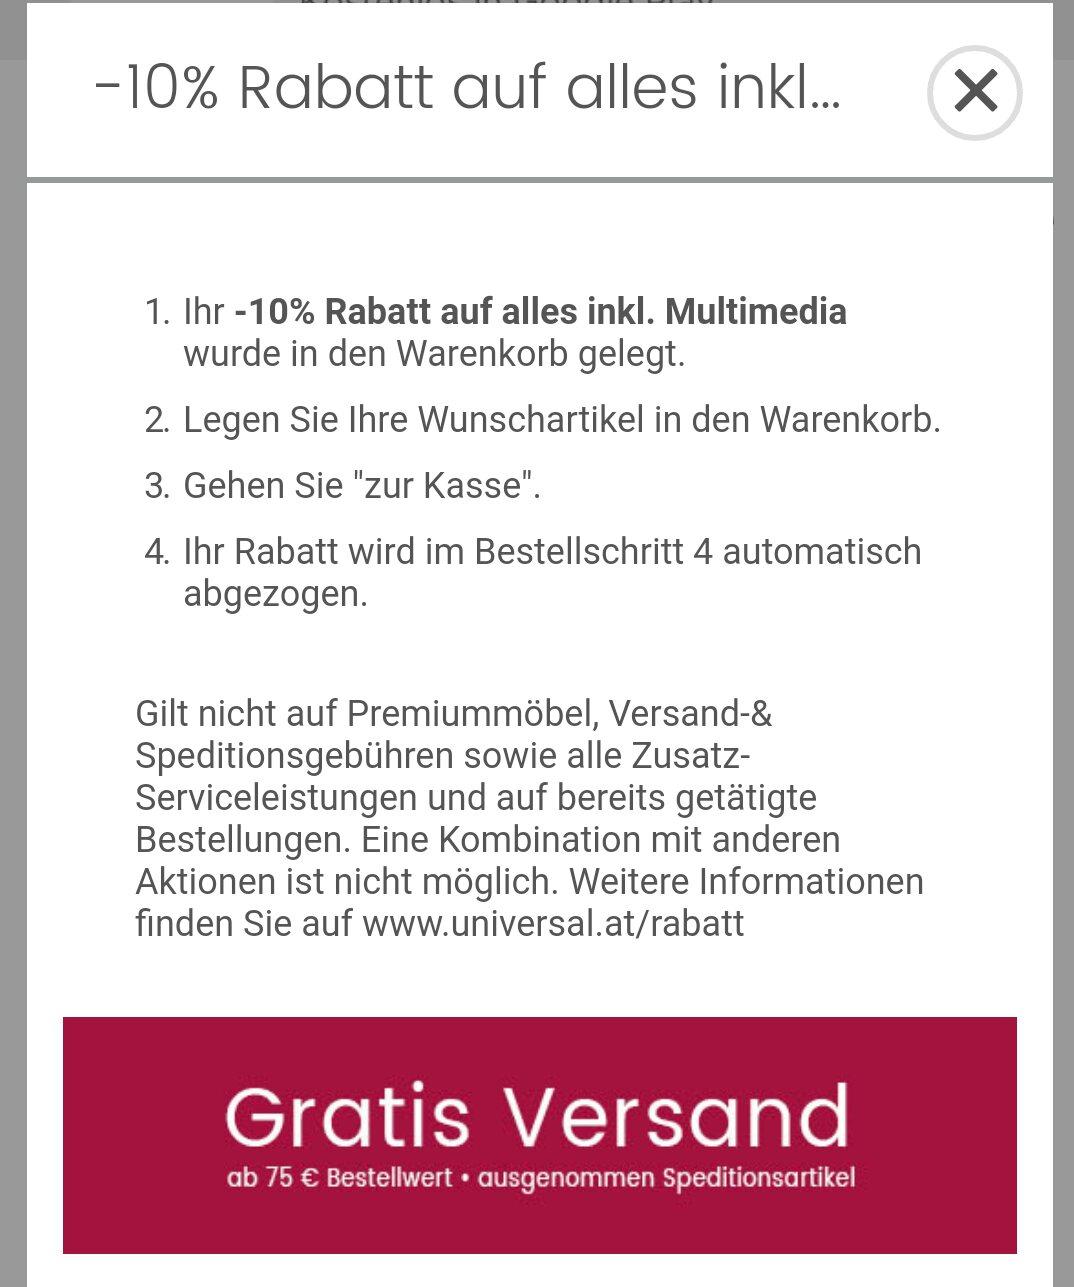 Universal -10% Rabatt auf alles inkl. Multimedia